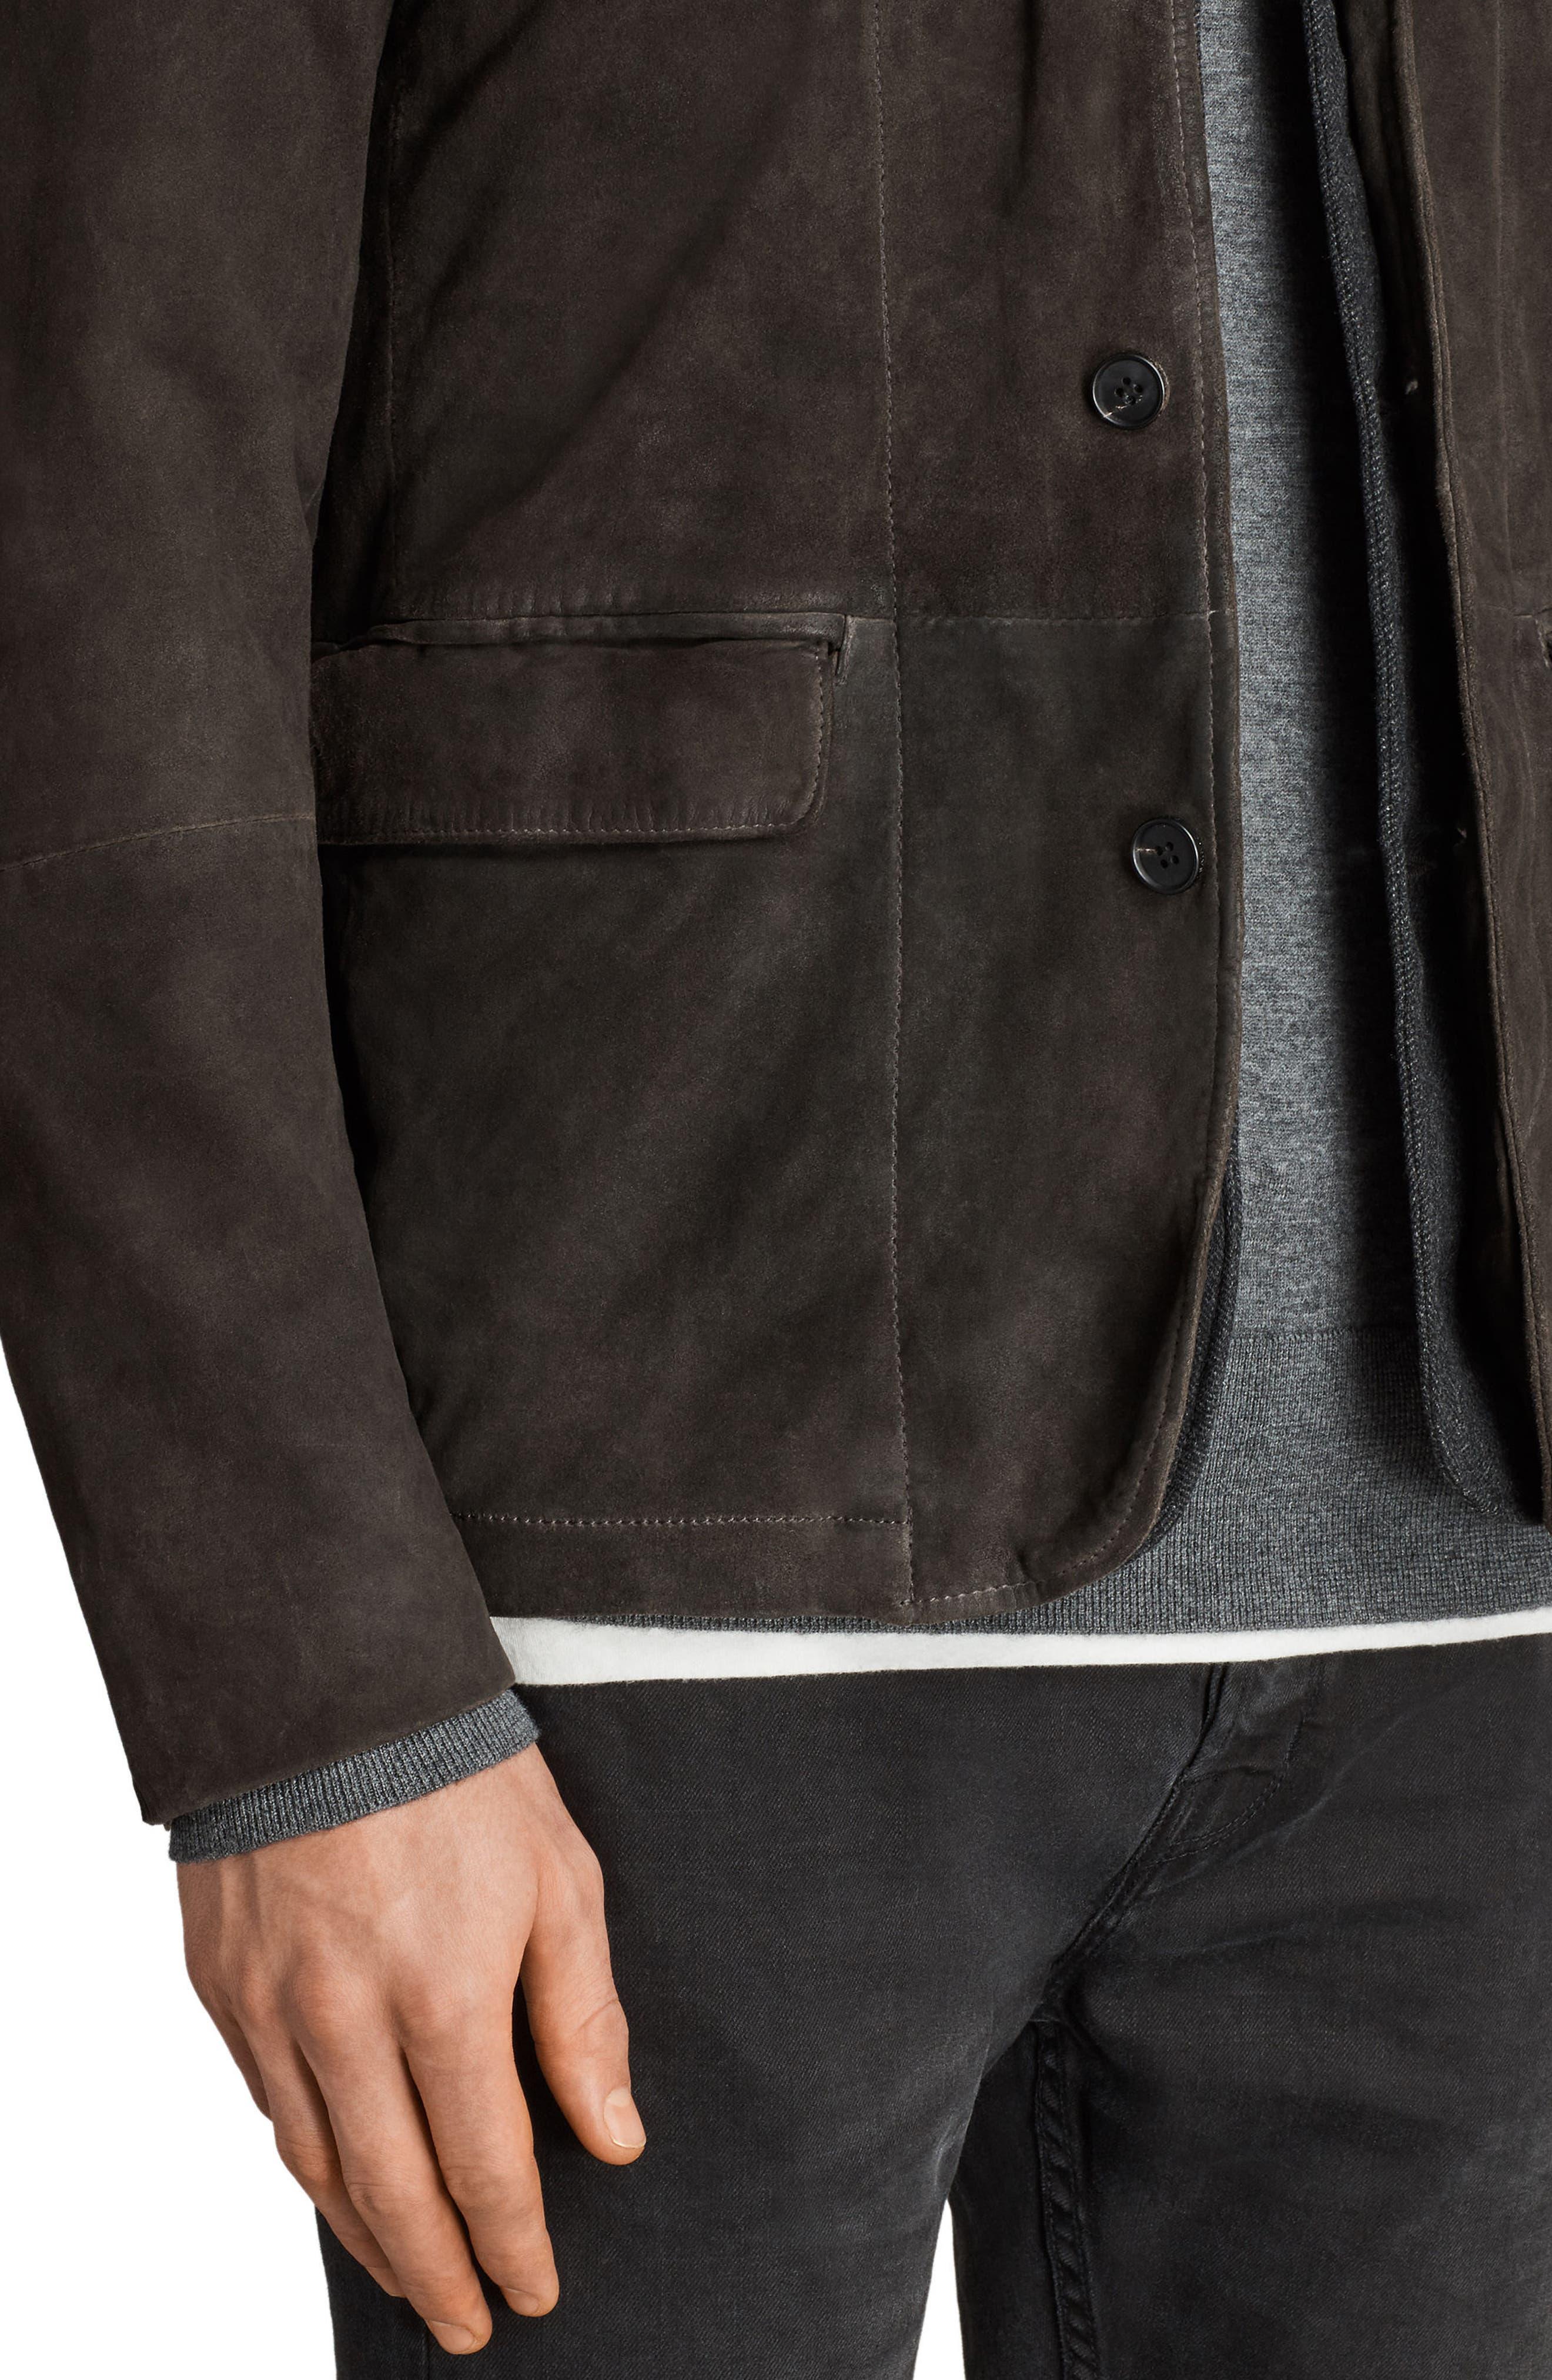 Survey Leather Blazer,                             Alternate thumbnail 3, color,                             Anthracite Grey